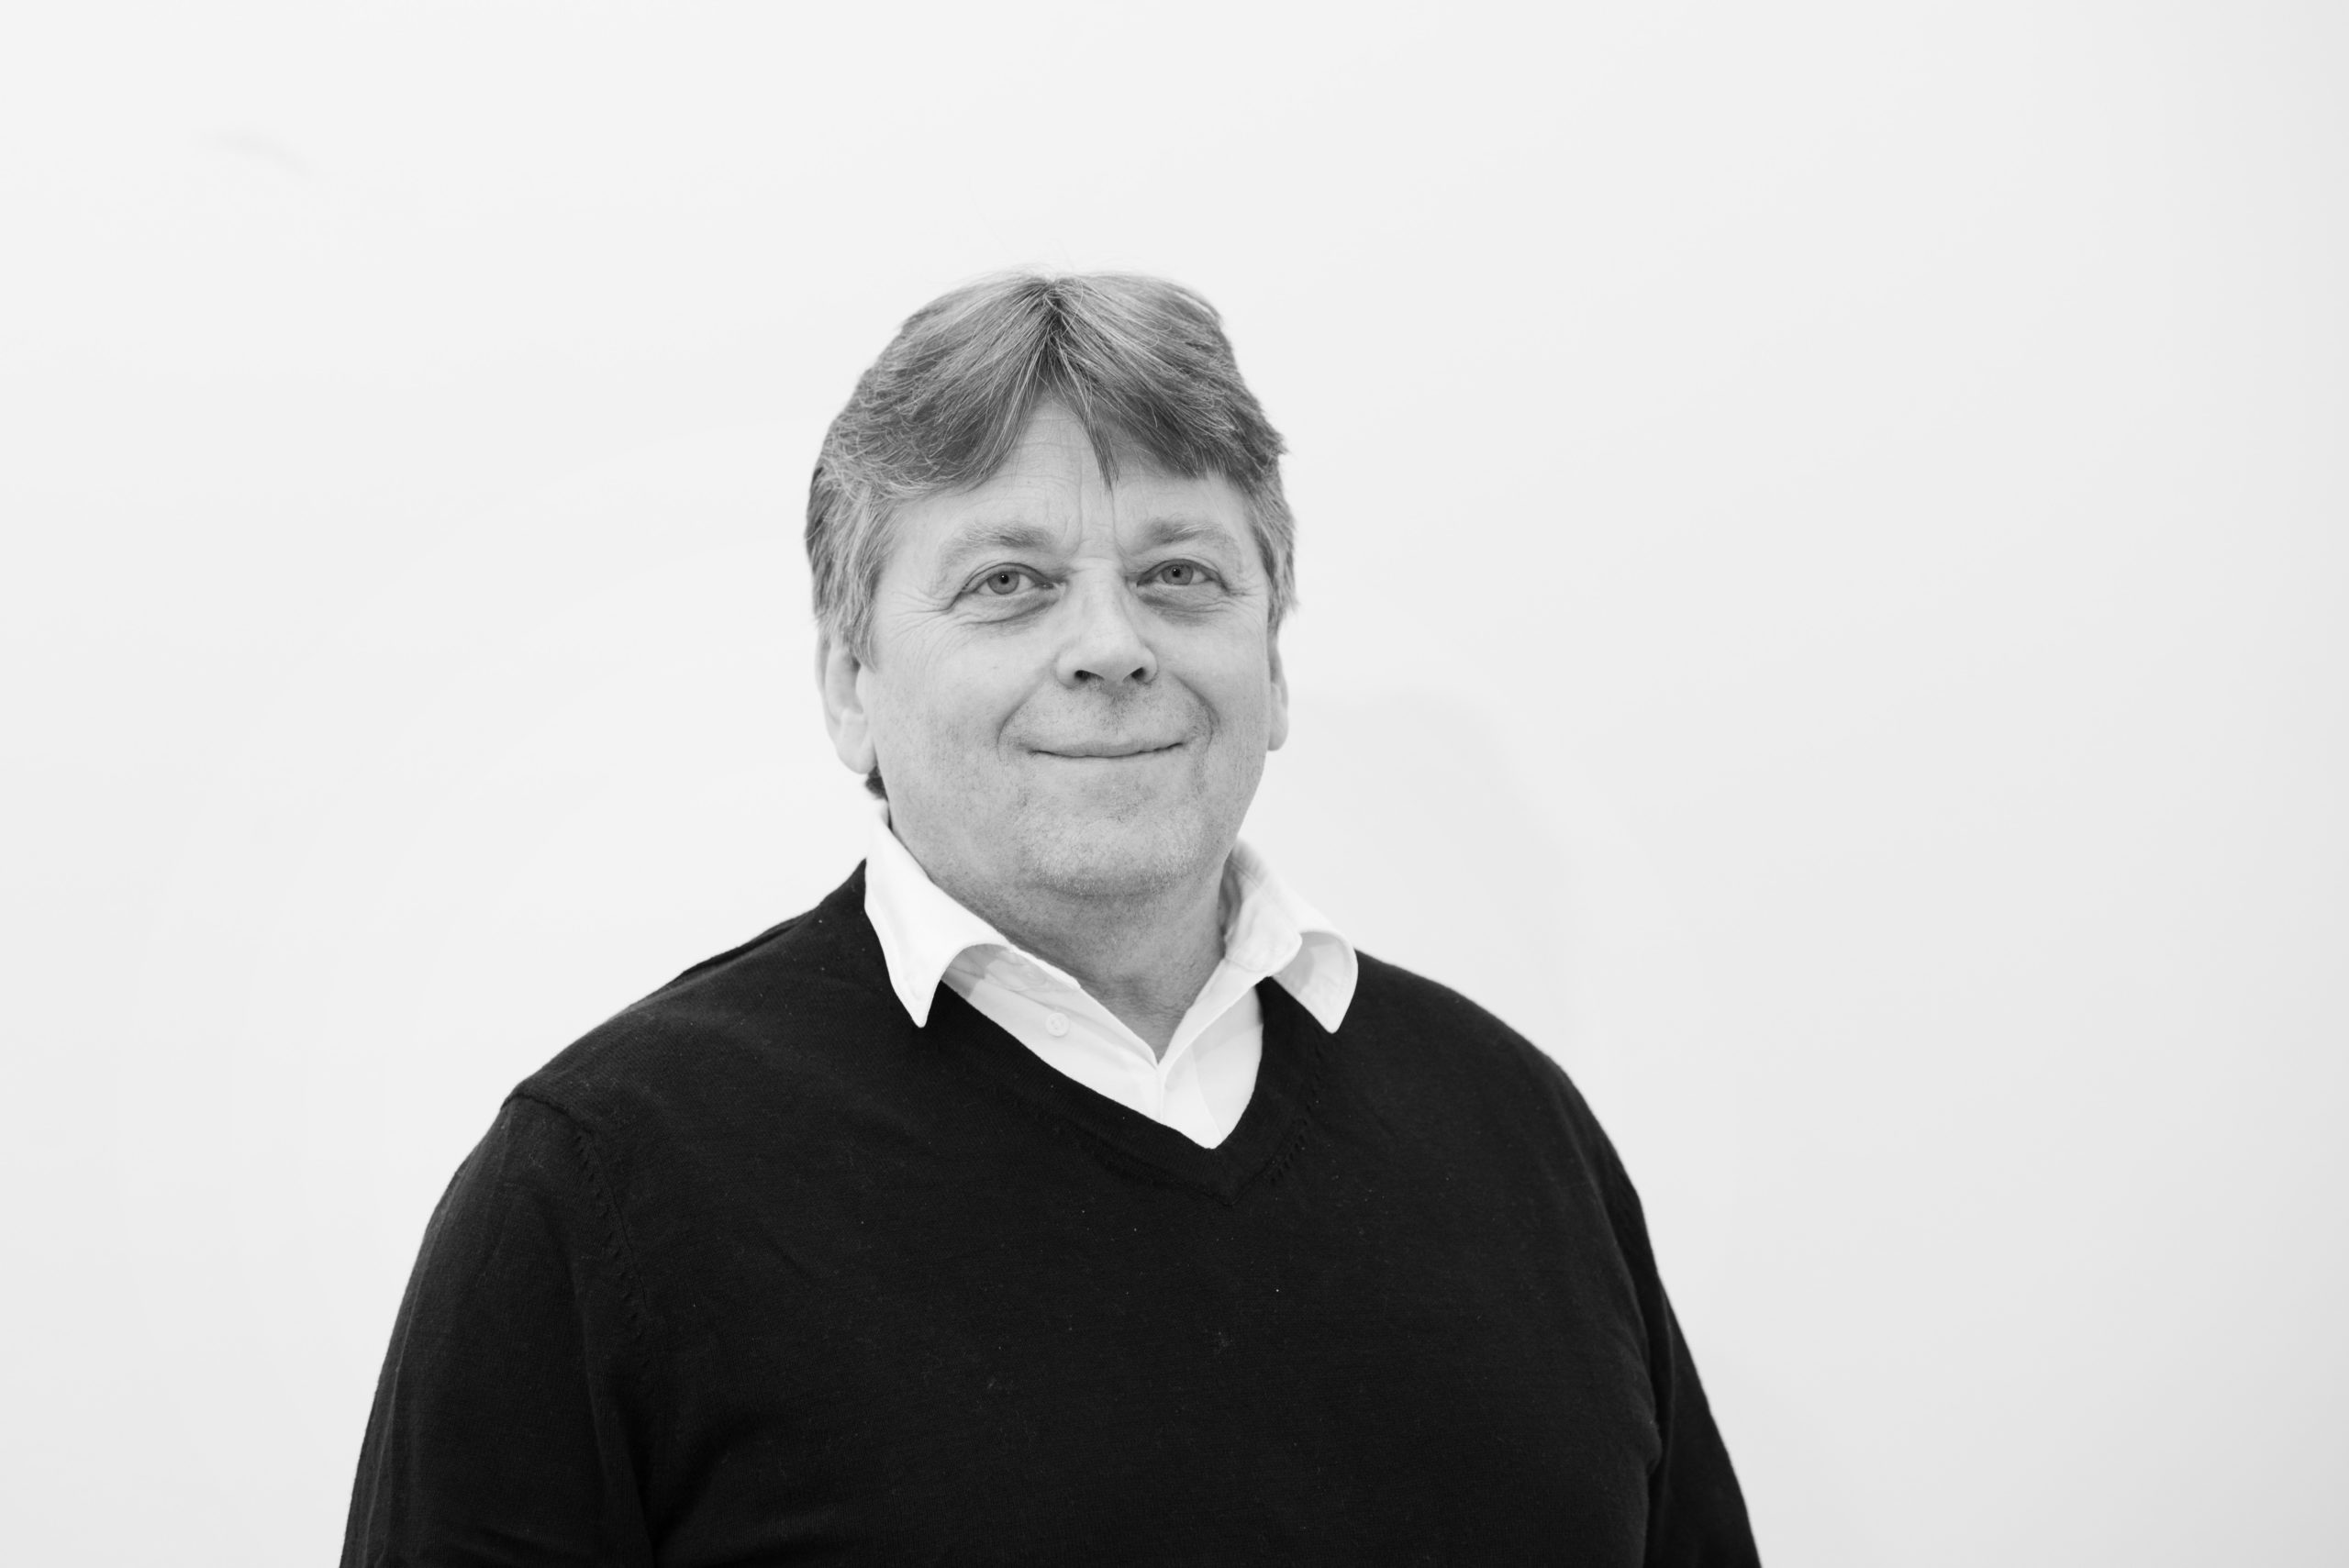 Michael Bo Andersen